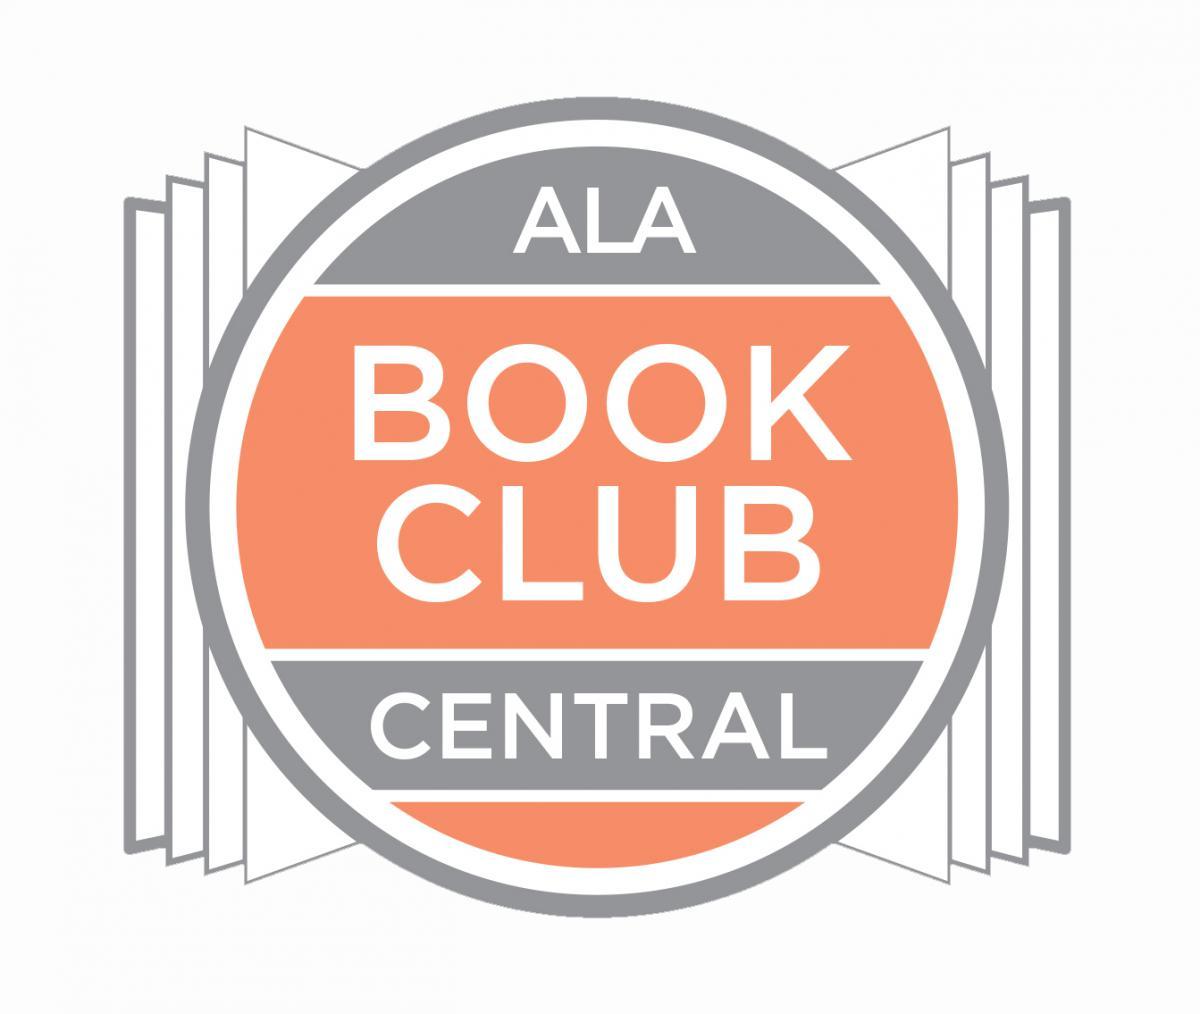 pl_ala-book-club-central-logo-lge.jpg